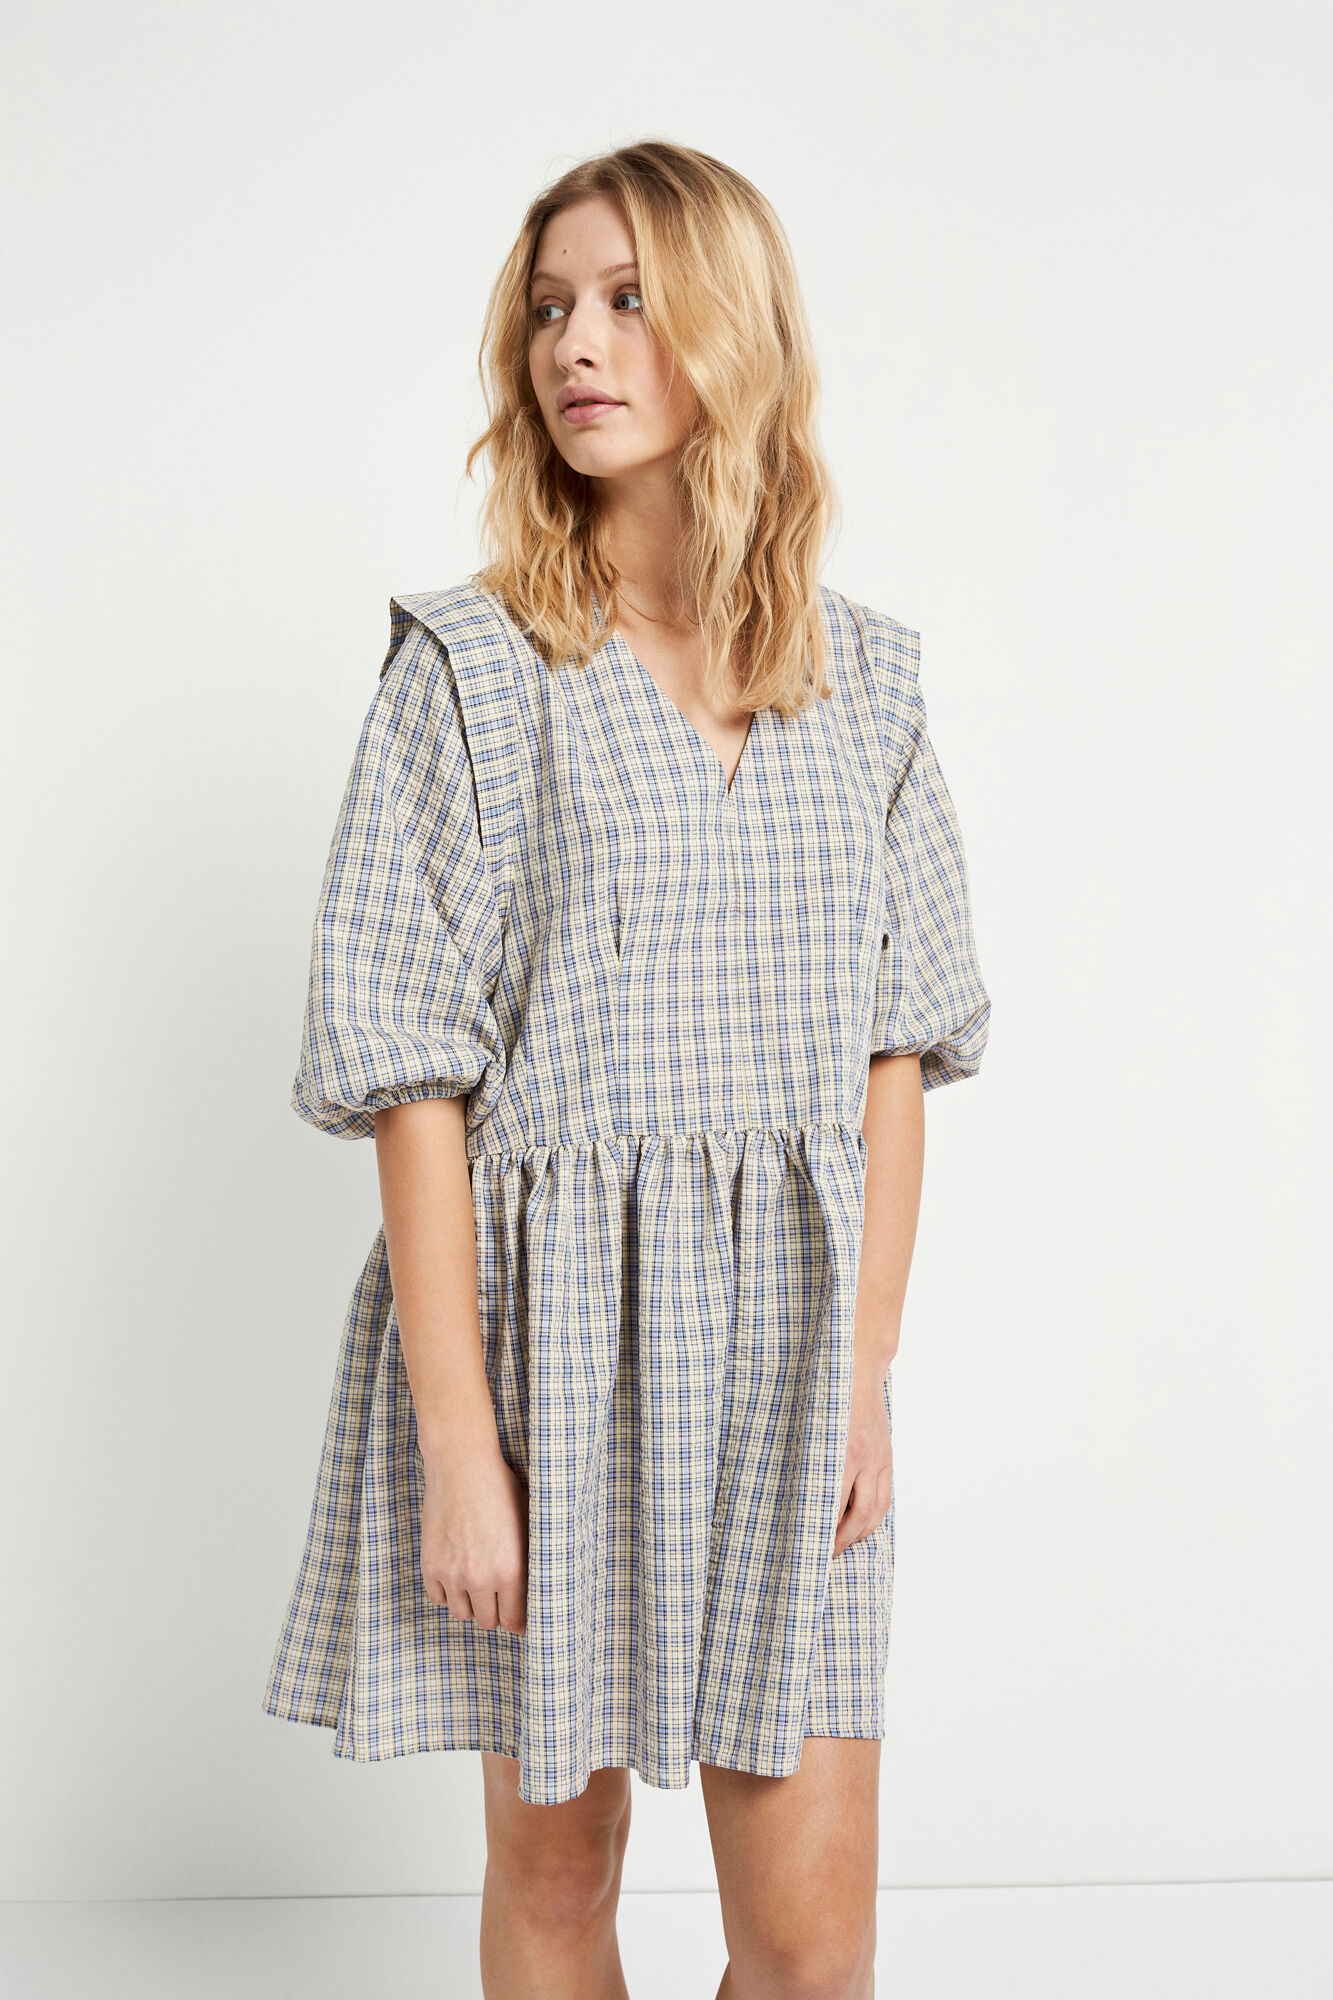 ENRAYES 3/4 DRESS 6715